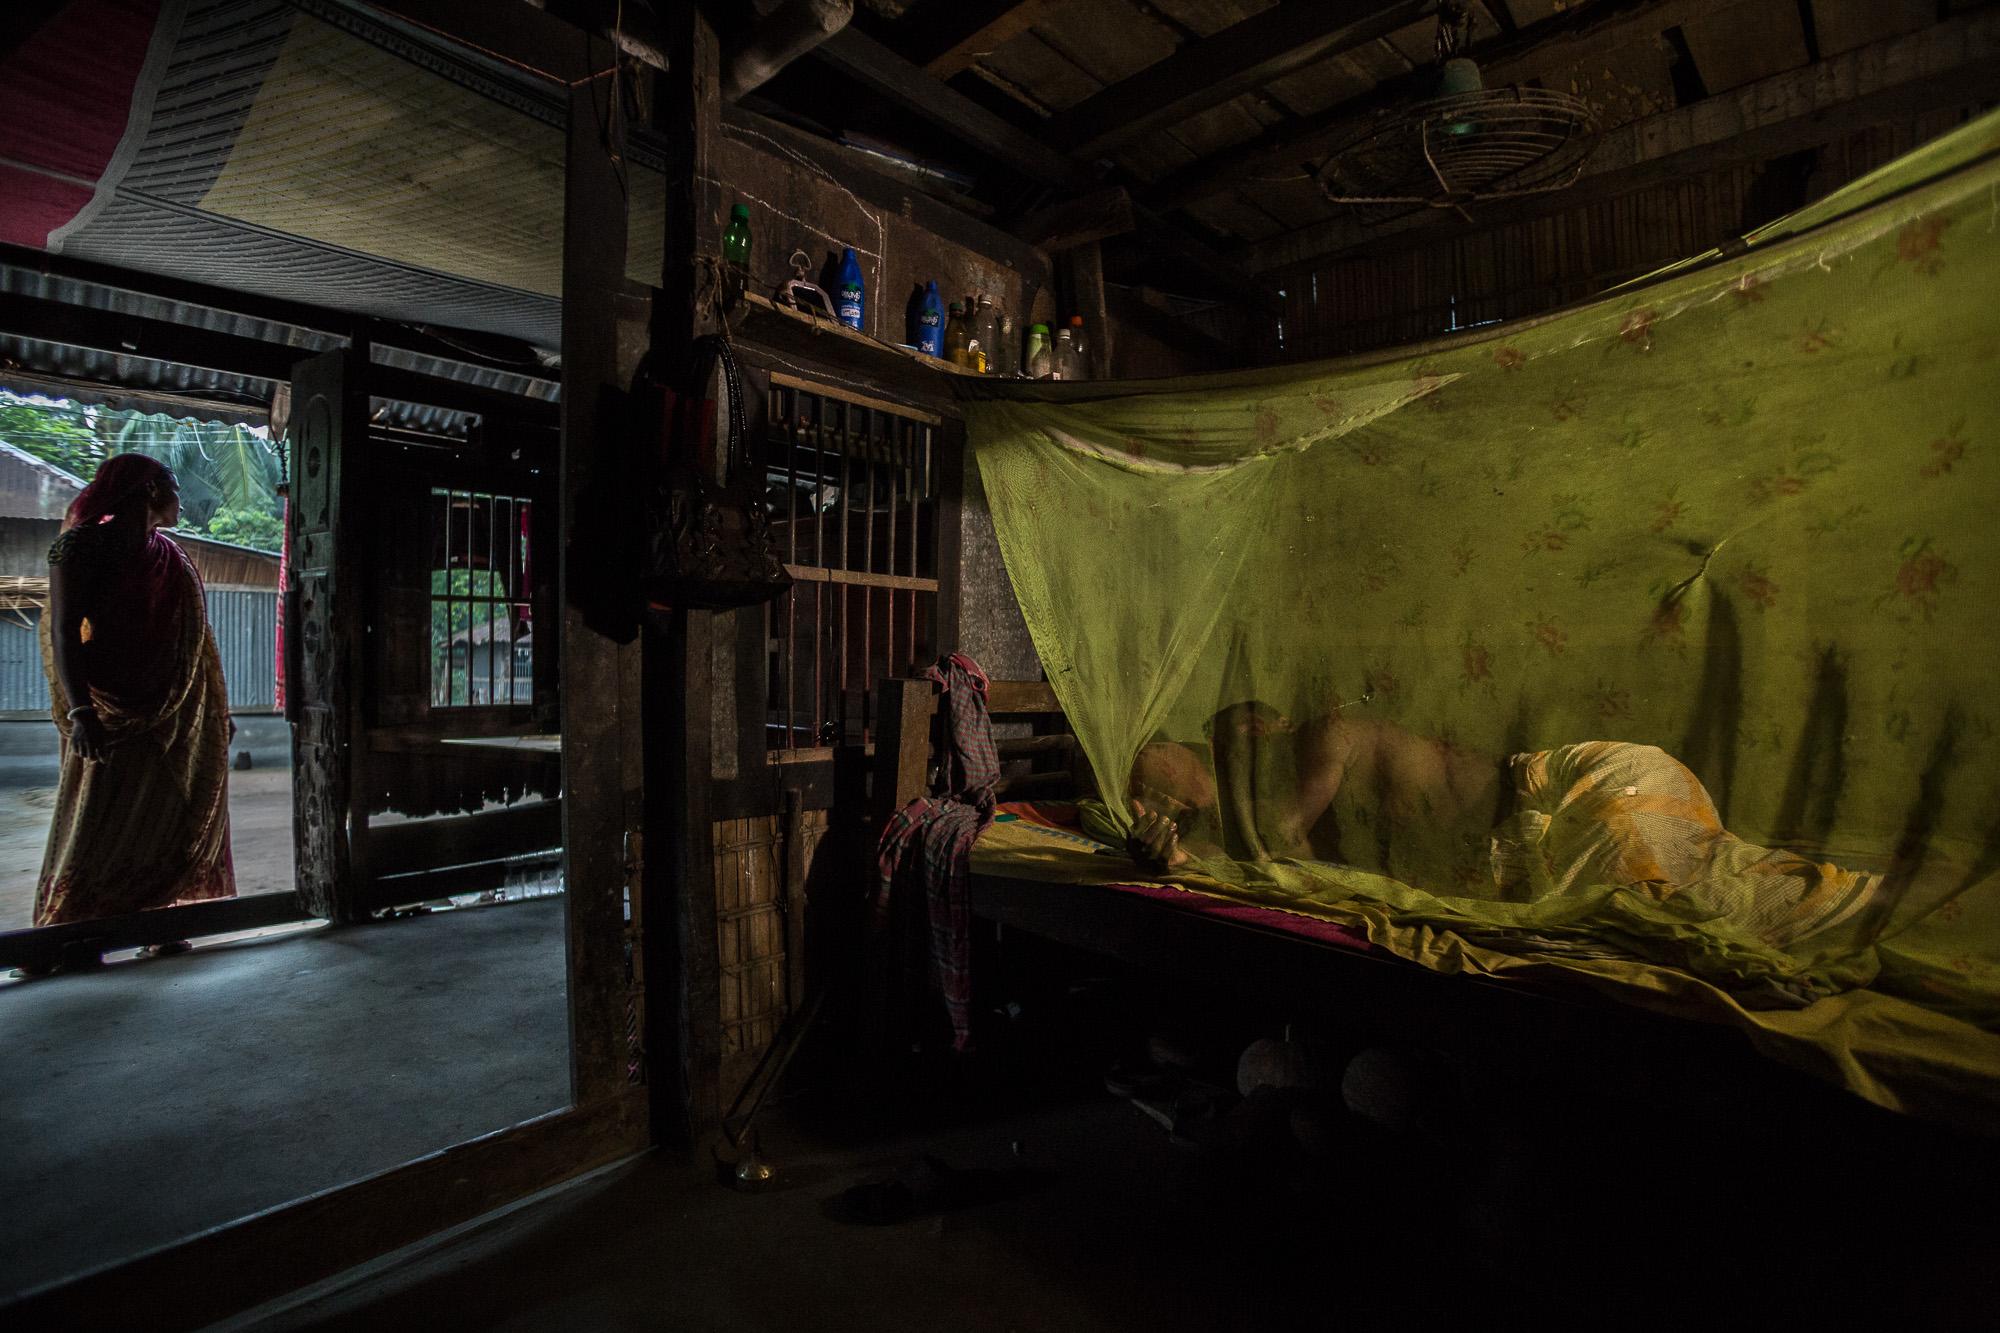 Tarani Kanto Shikari, 45,and his wife, Baby Shikari,wake up before dawn every morning to tend to their rice patties, cows, ducks, and vegetable garden in southern Bangladesh.